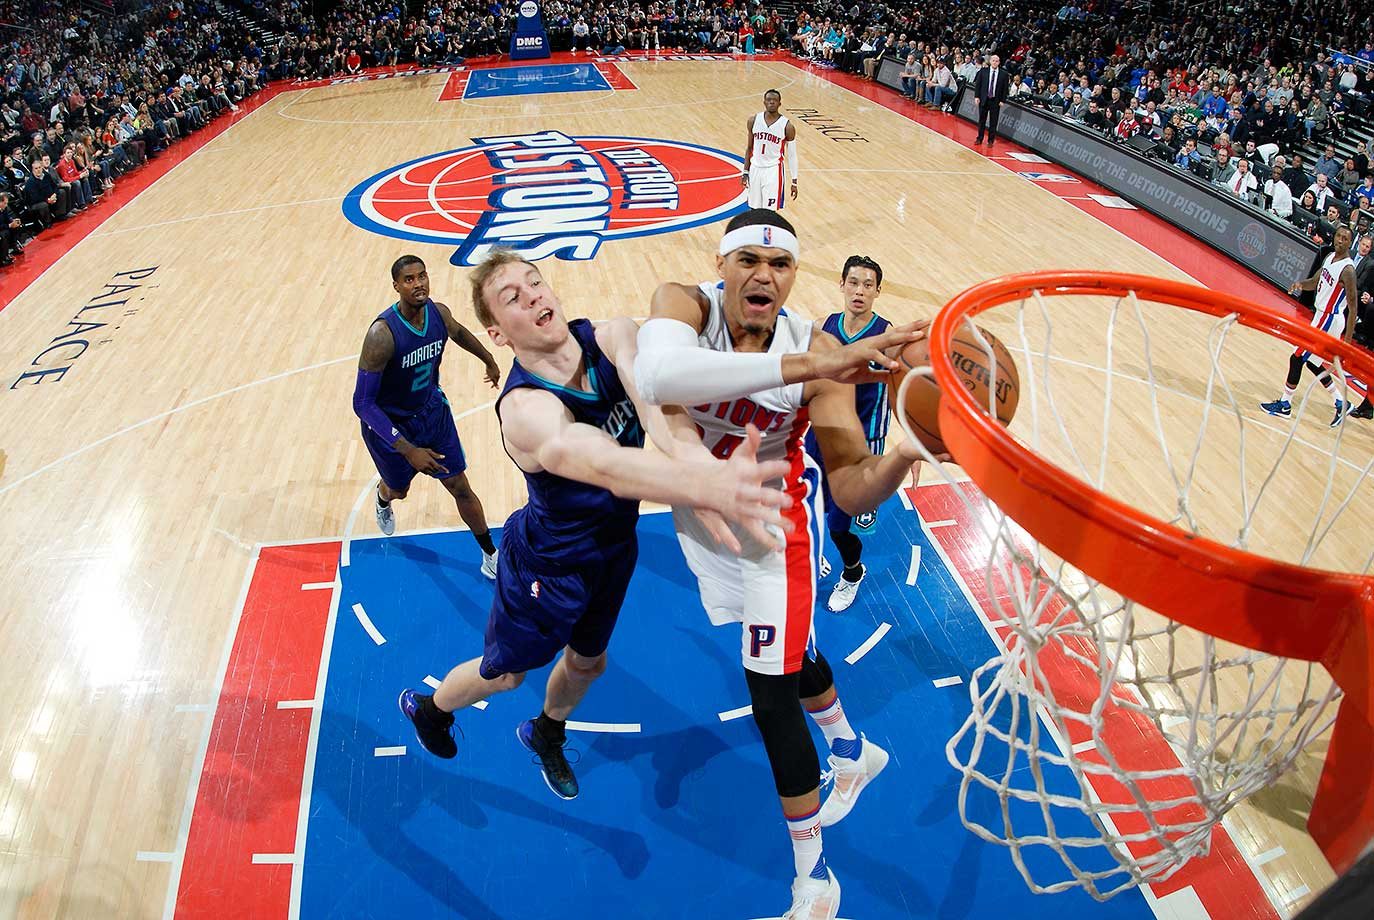 Tobias Harris of the Detroit Pistons shoots the ball against Cody Zeller of the Charlotte Hornets.